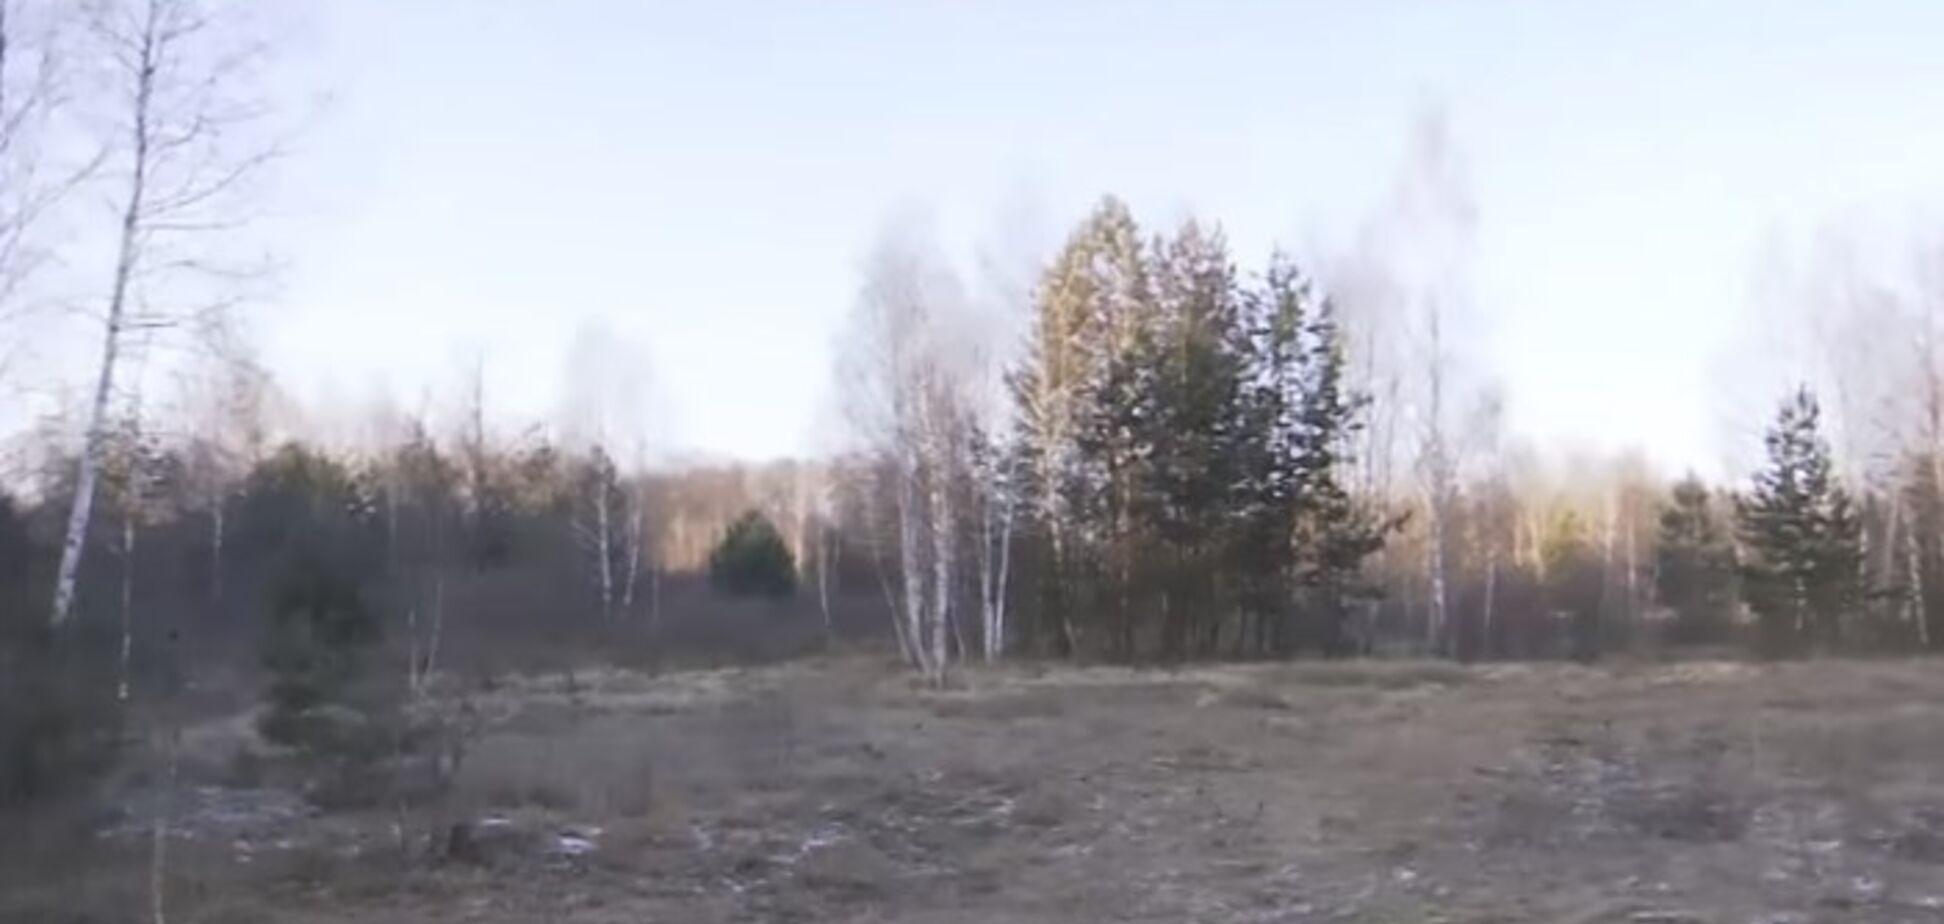 'Организатора не назову из-за страха': на Волыни провернули масштабную янтарную аферу